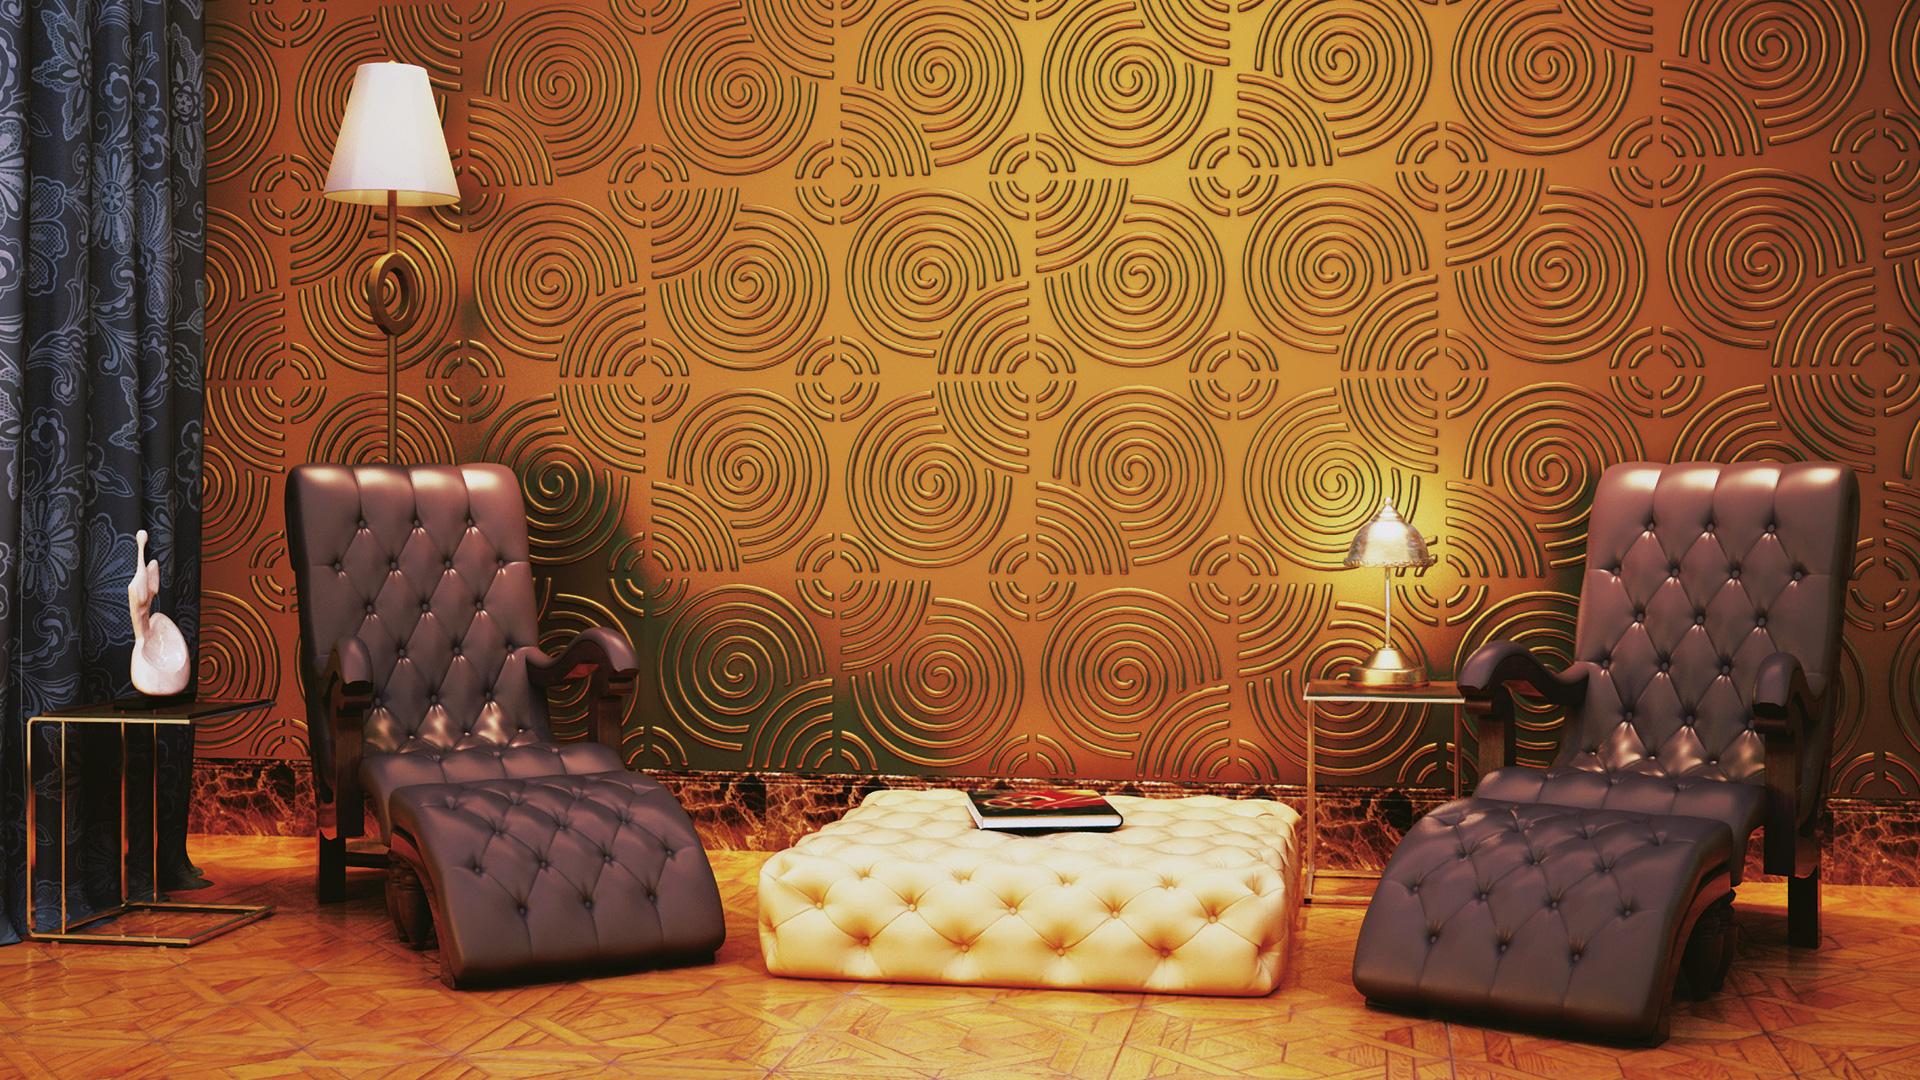 3D Wandpaneele - Produkte - Ripple - Deckenpaneele - 3D Tapeten - Wandverkleidung